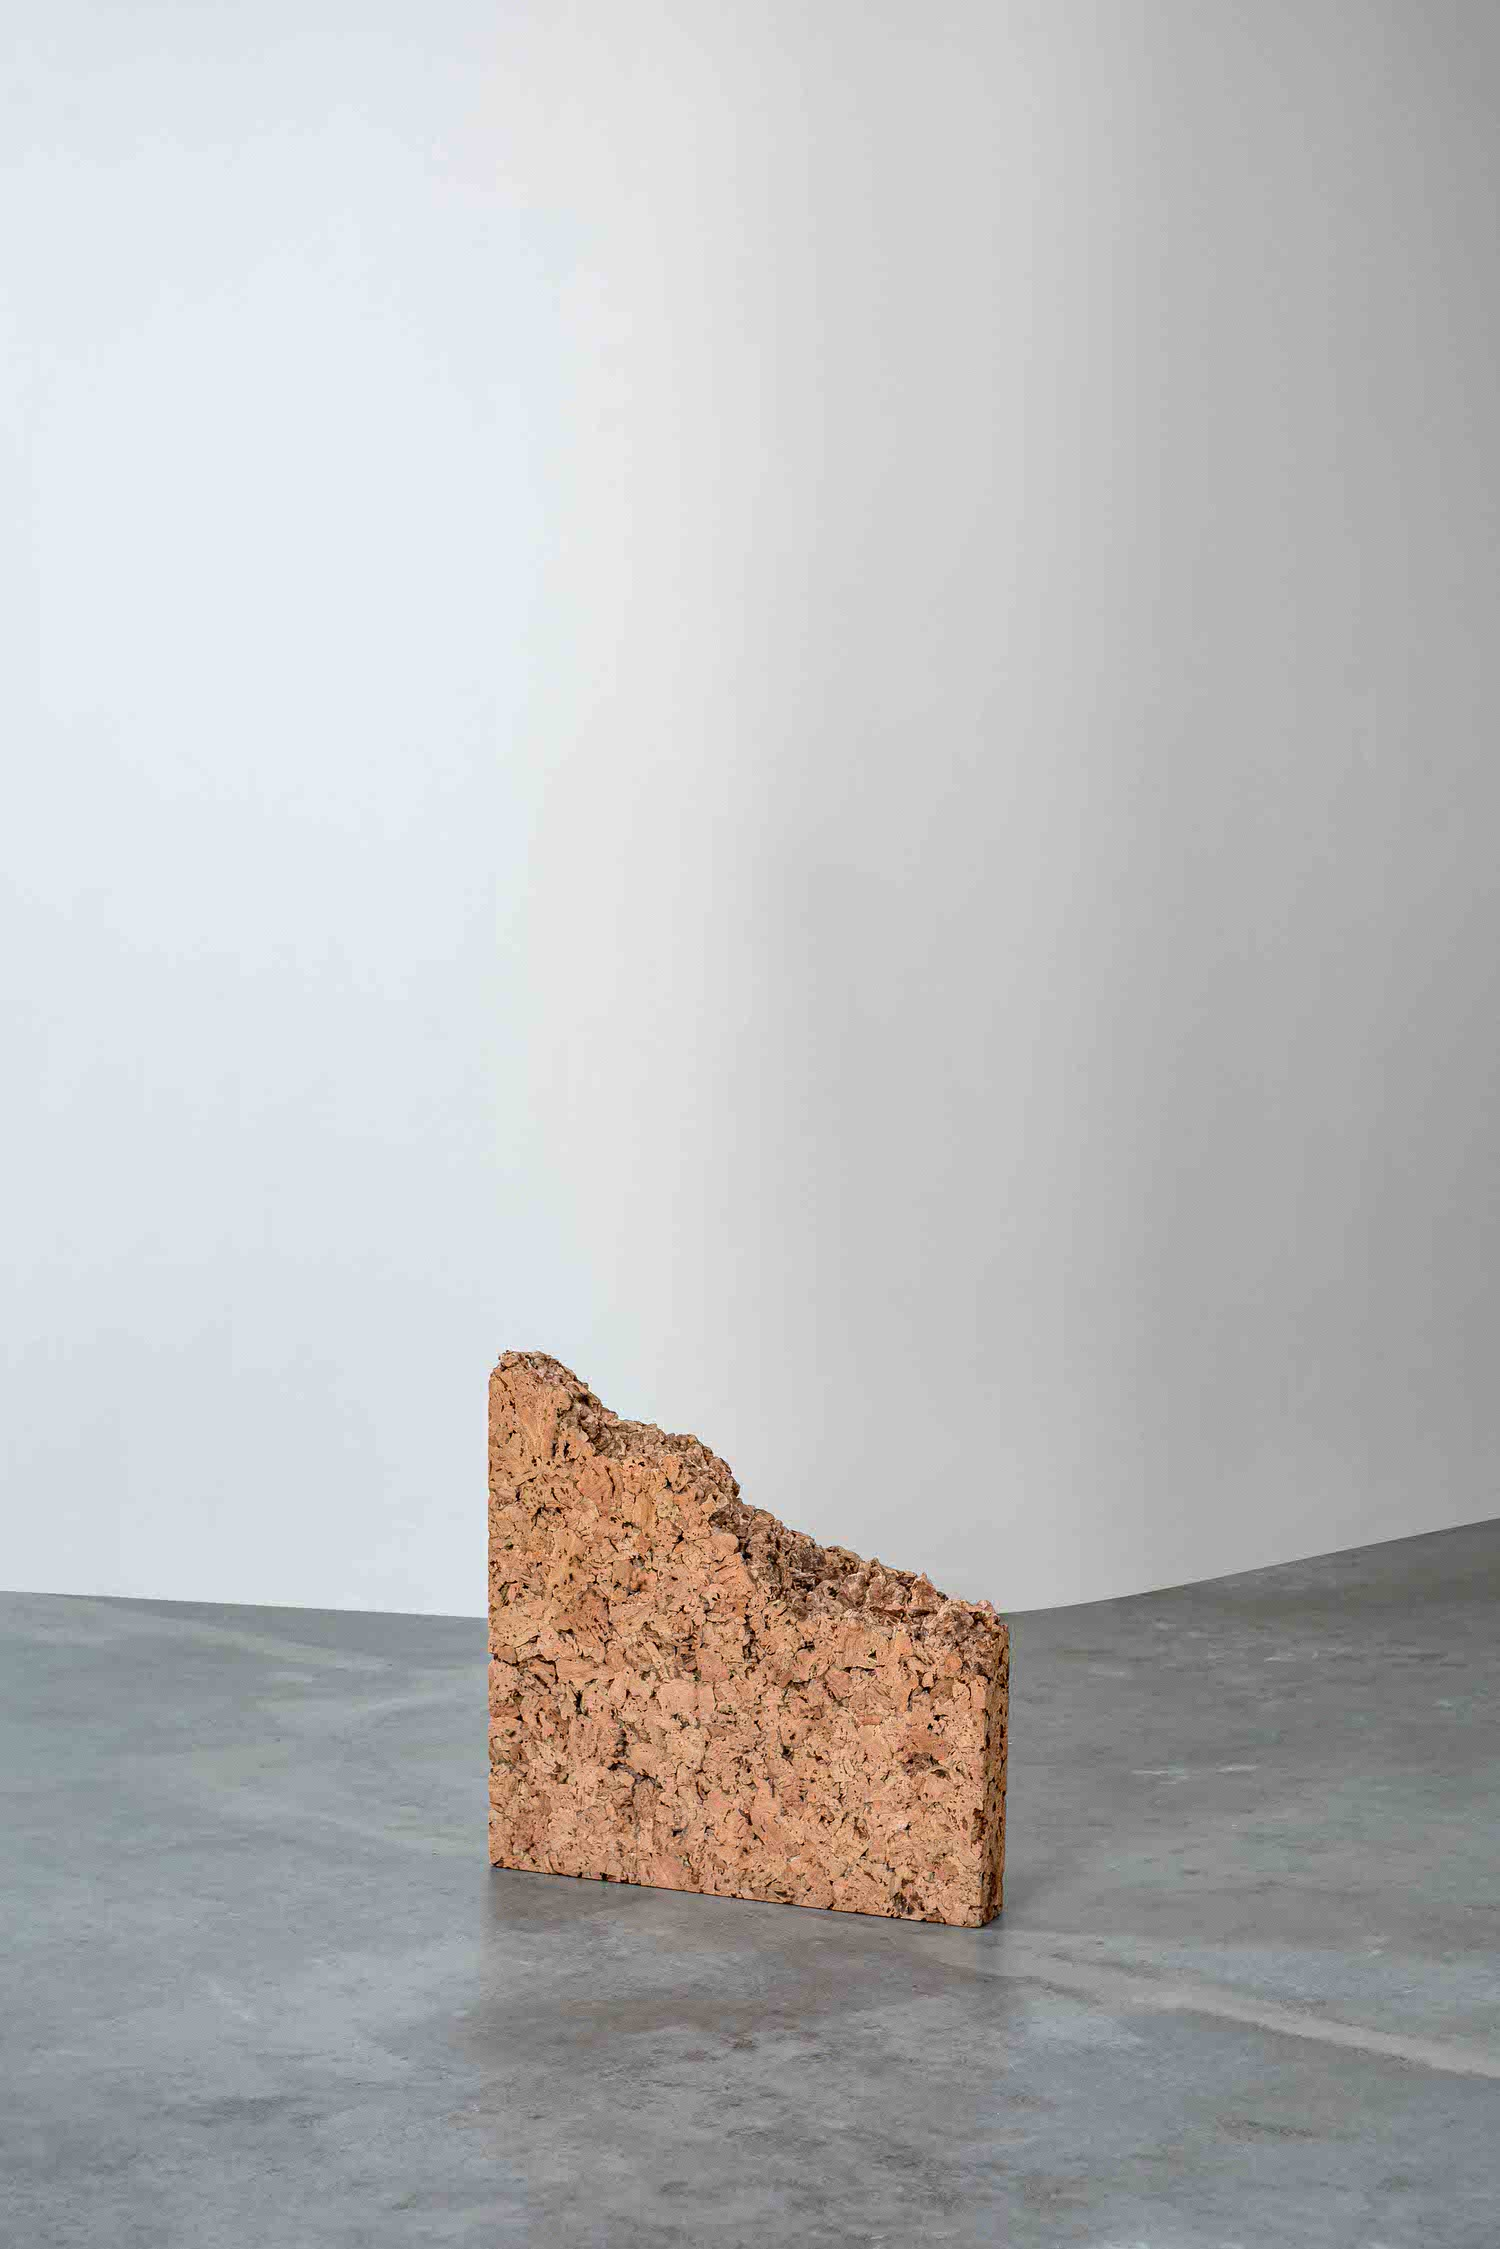 Noe Duchaufour Lawrance Burnt Cork Collection Made In Situ Photo Nuno Sousa Dias Yellowtrace 14